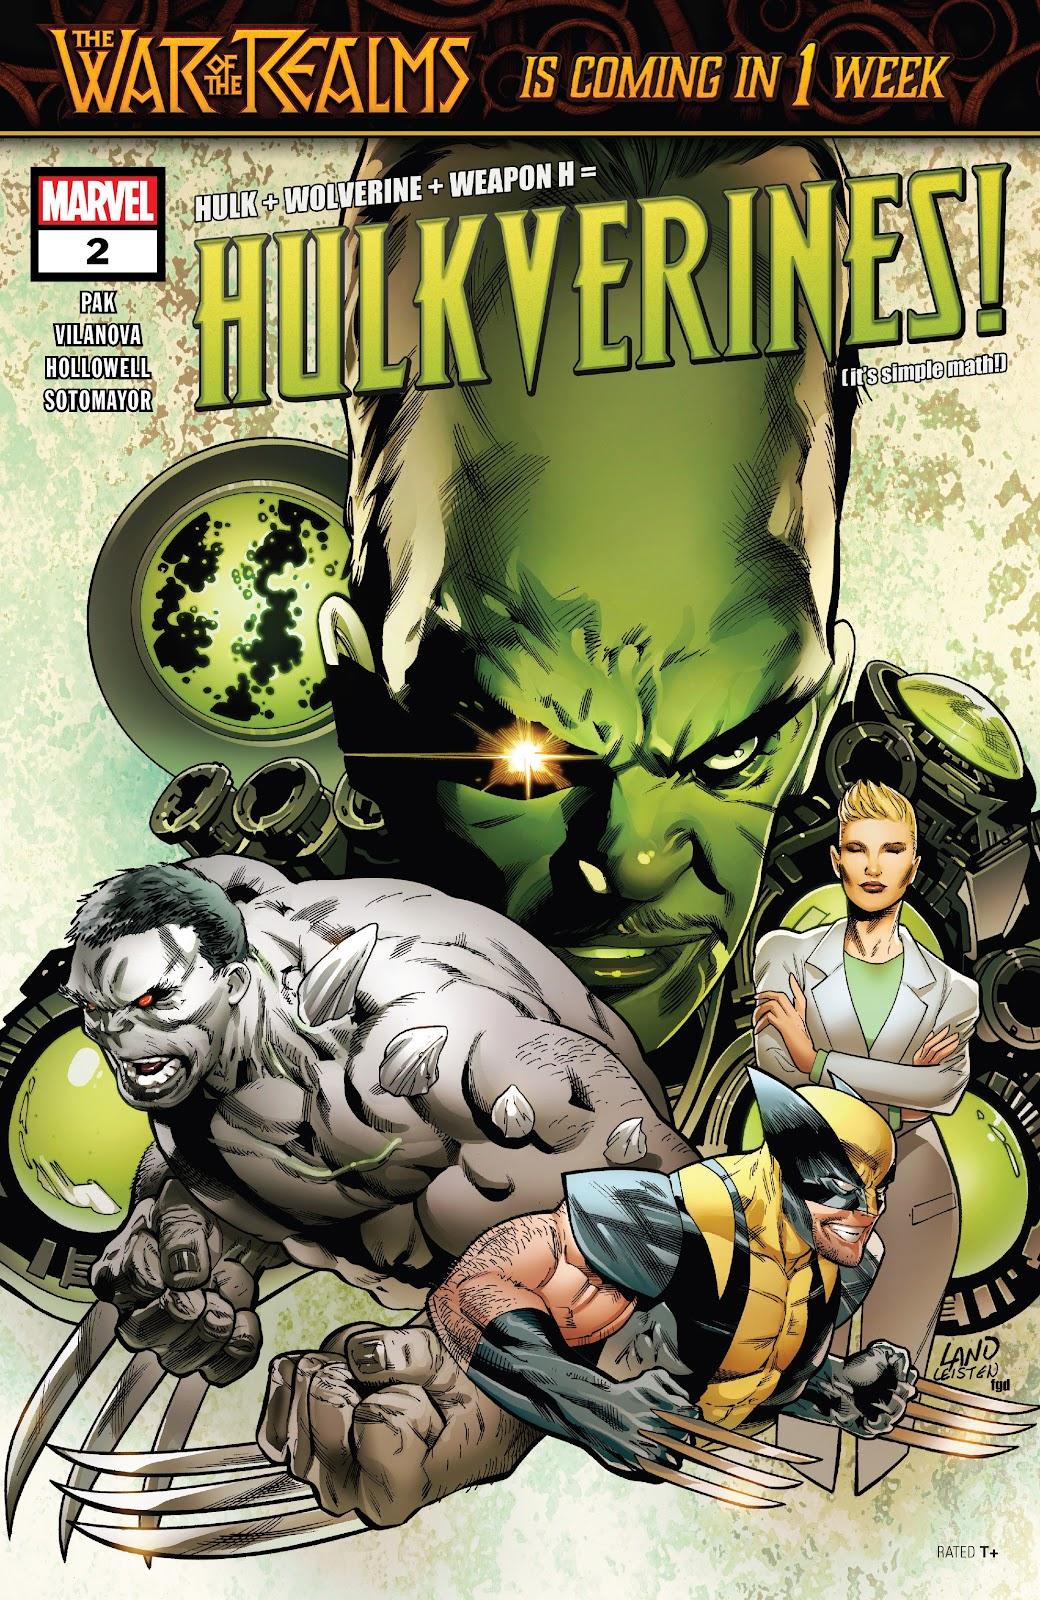 Read online Hulkverines comic -  Issue #2 - 1